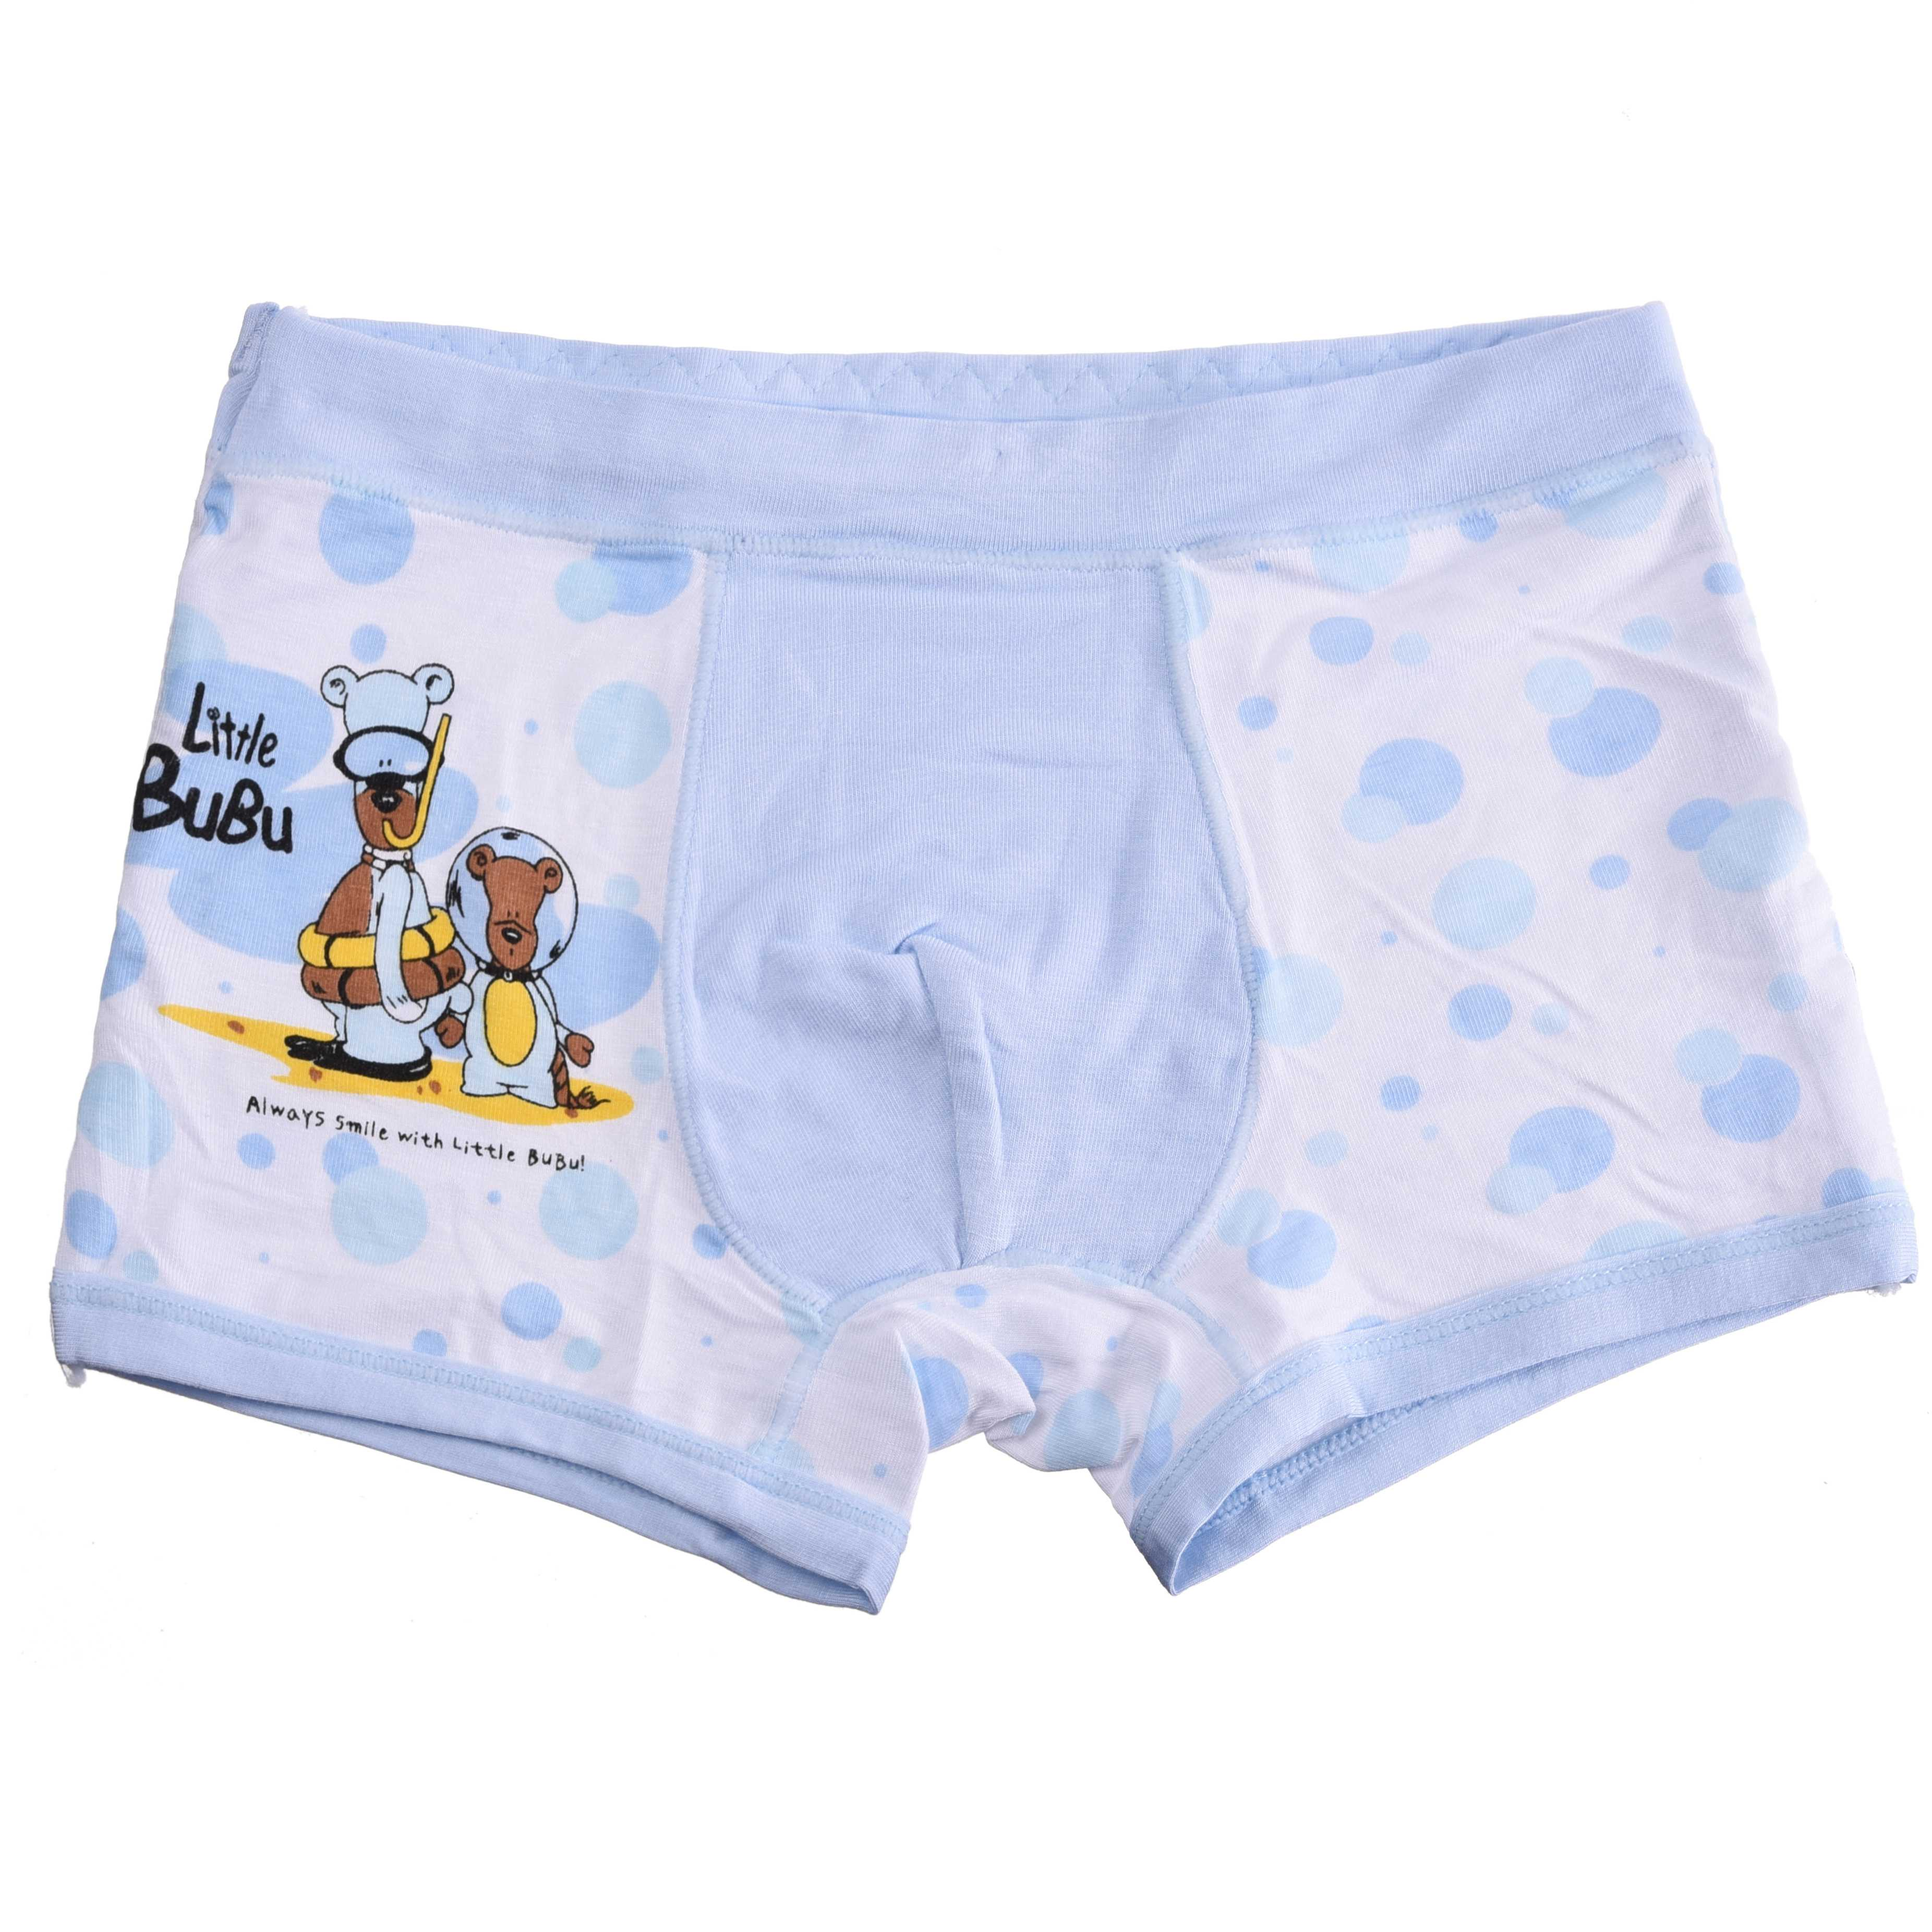 Bamboo Fiber Children Underwear Sports Boys Shorts Panties Kids